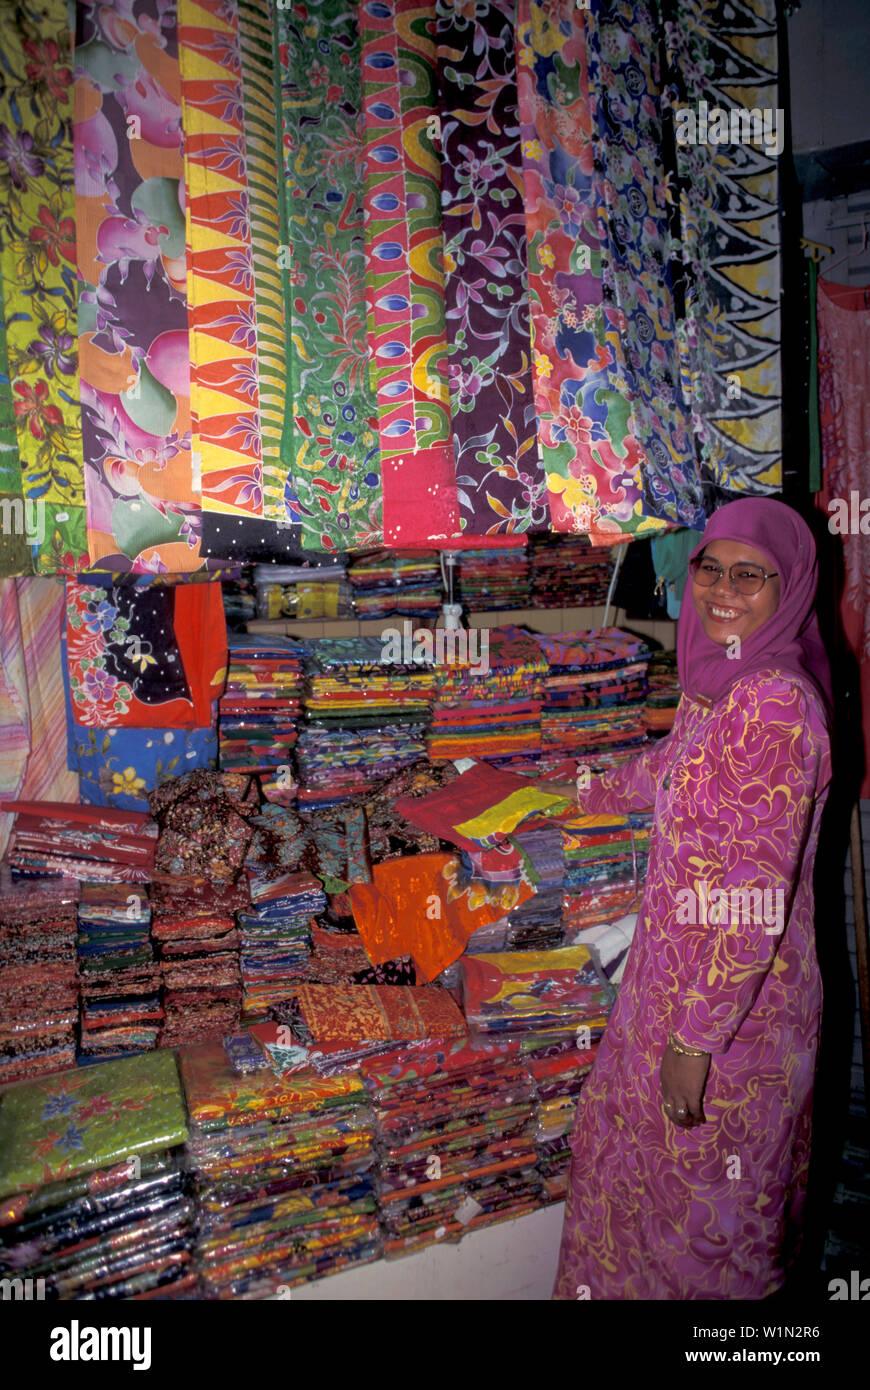 Laughing woman and colorful cloths, Kota Bharu, Batik, East coast, Malaysia, Asia - Stock Image